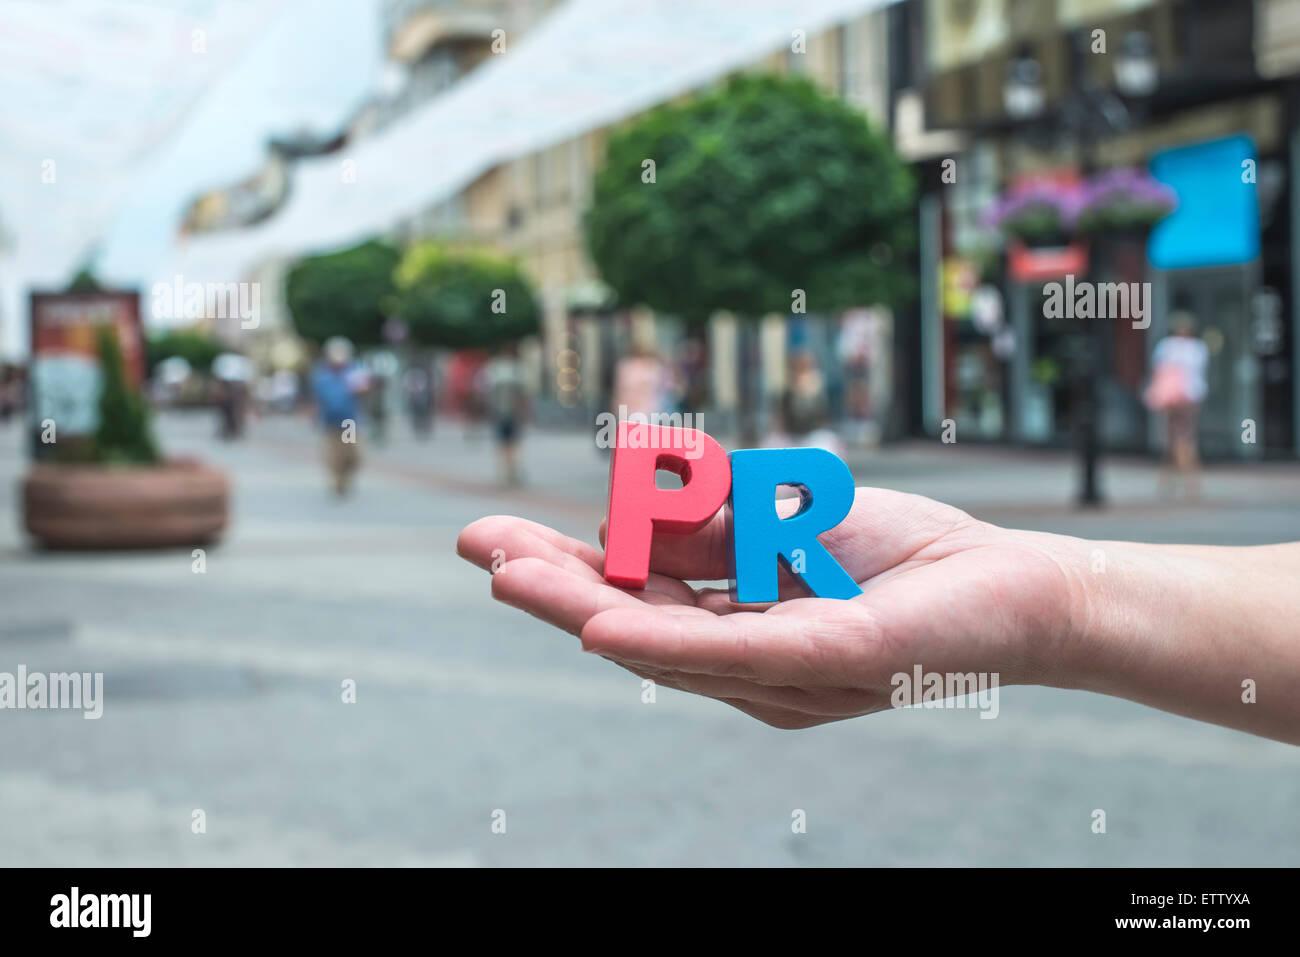 Bulgaria, Hands holding letters PR, pedestrian area - Stock Image